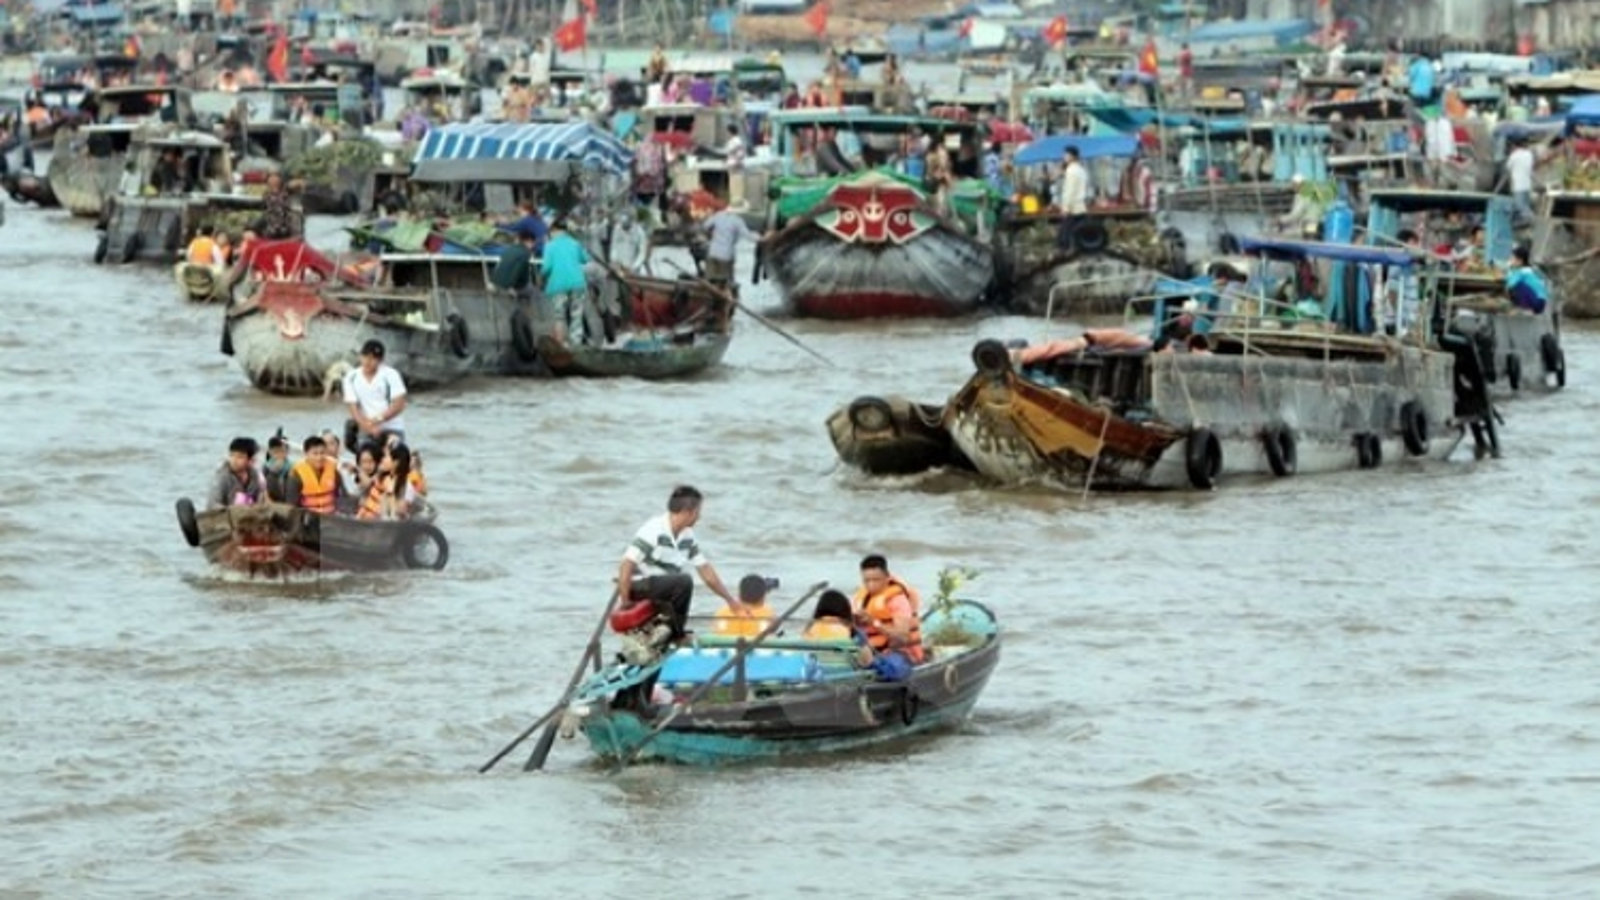 Hanoi cultural week features Cai Rang floating market